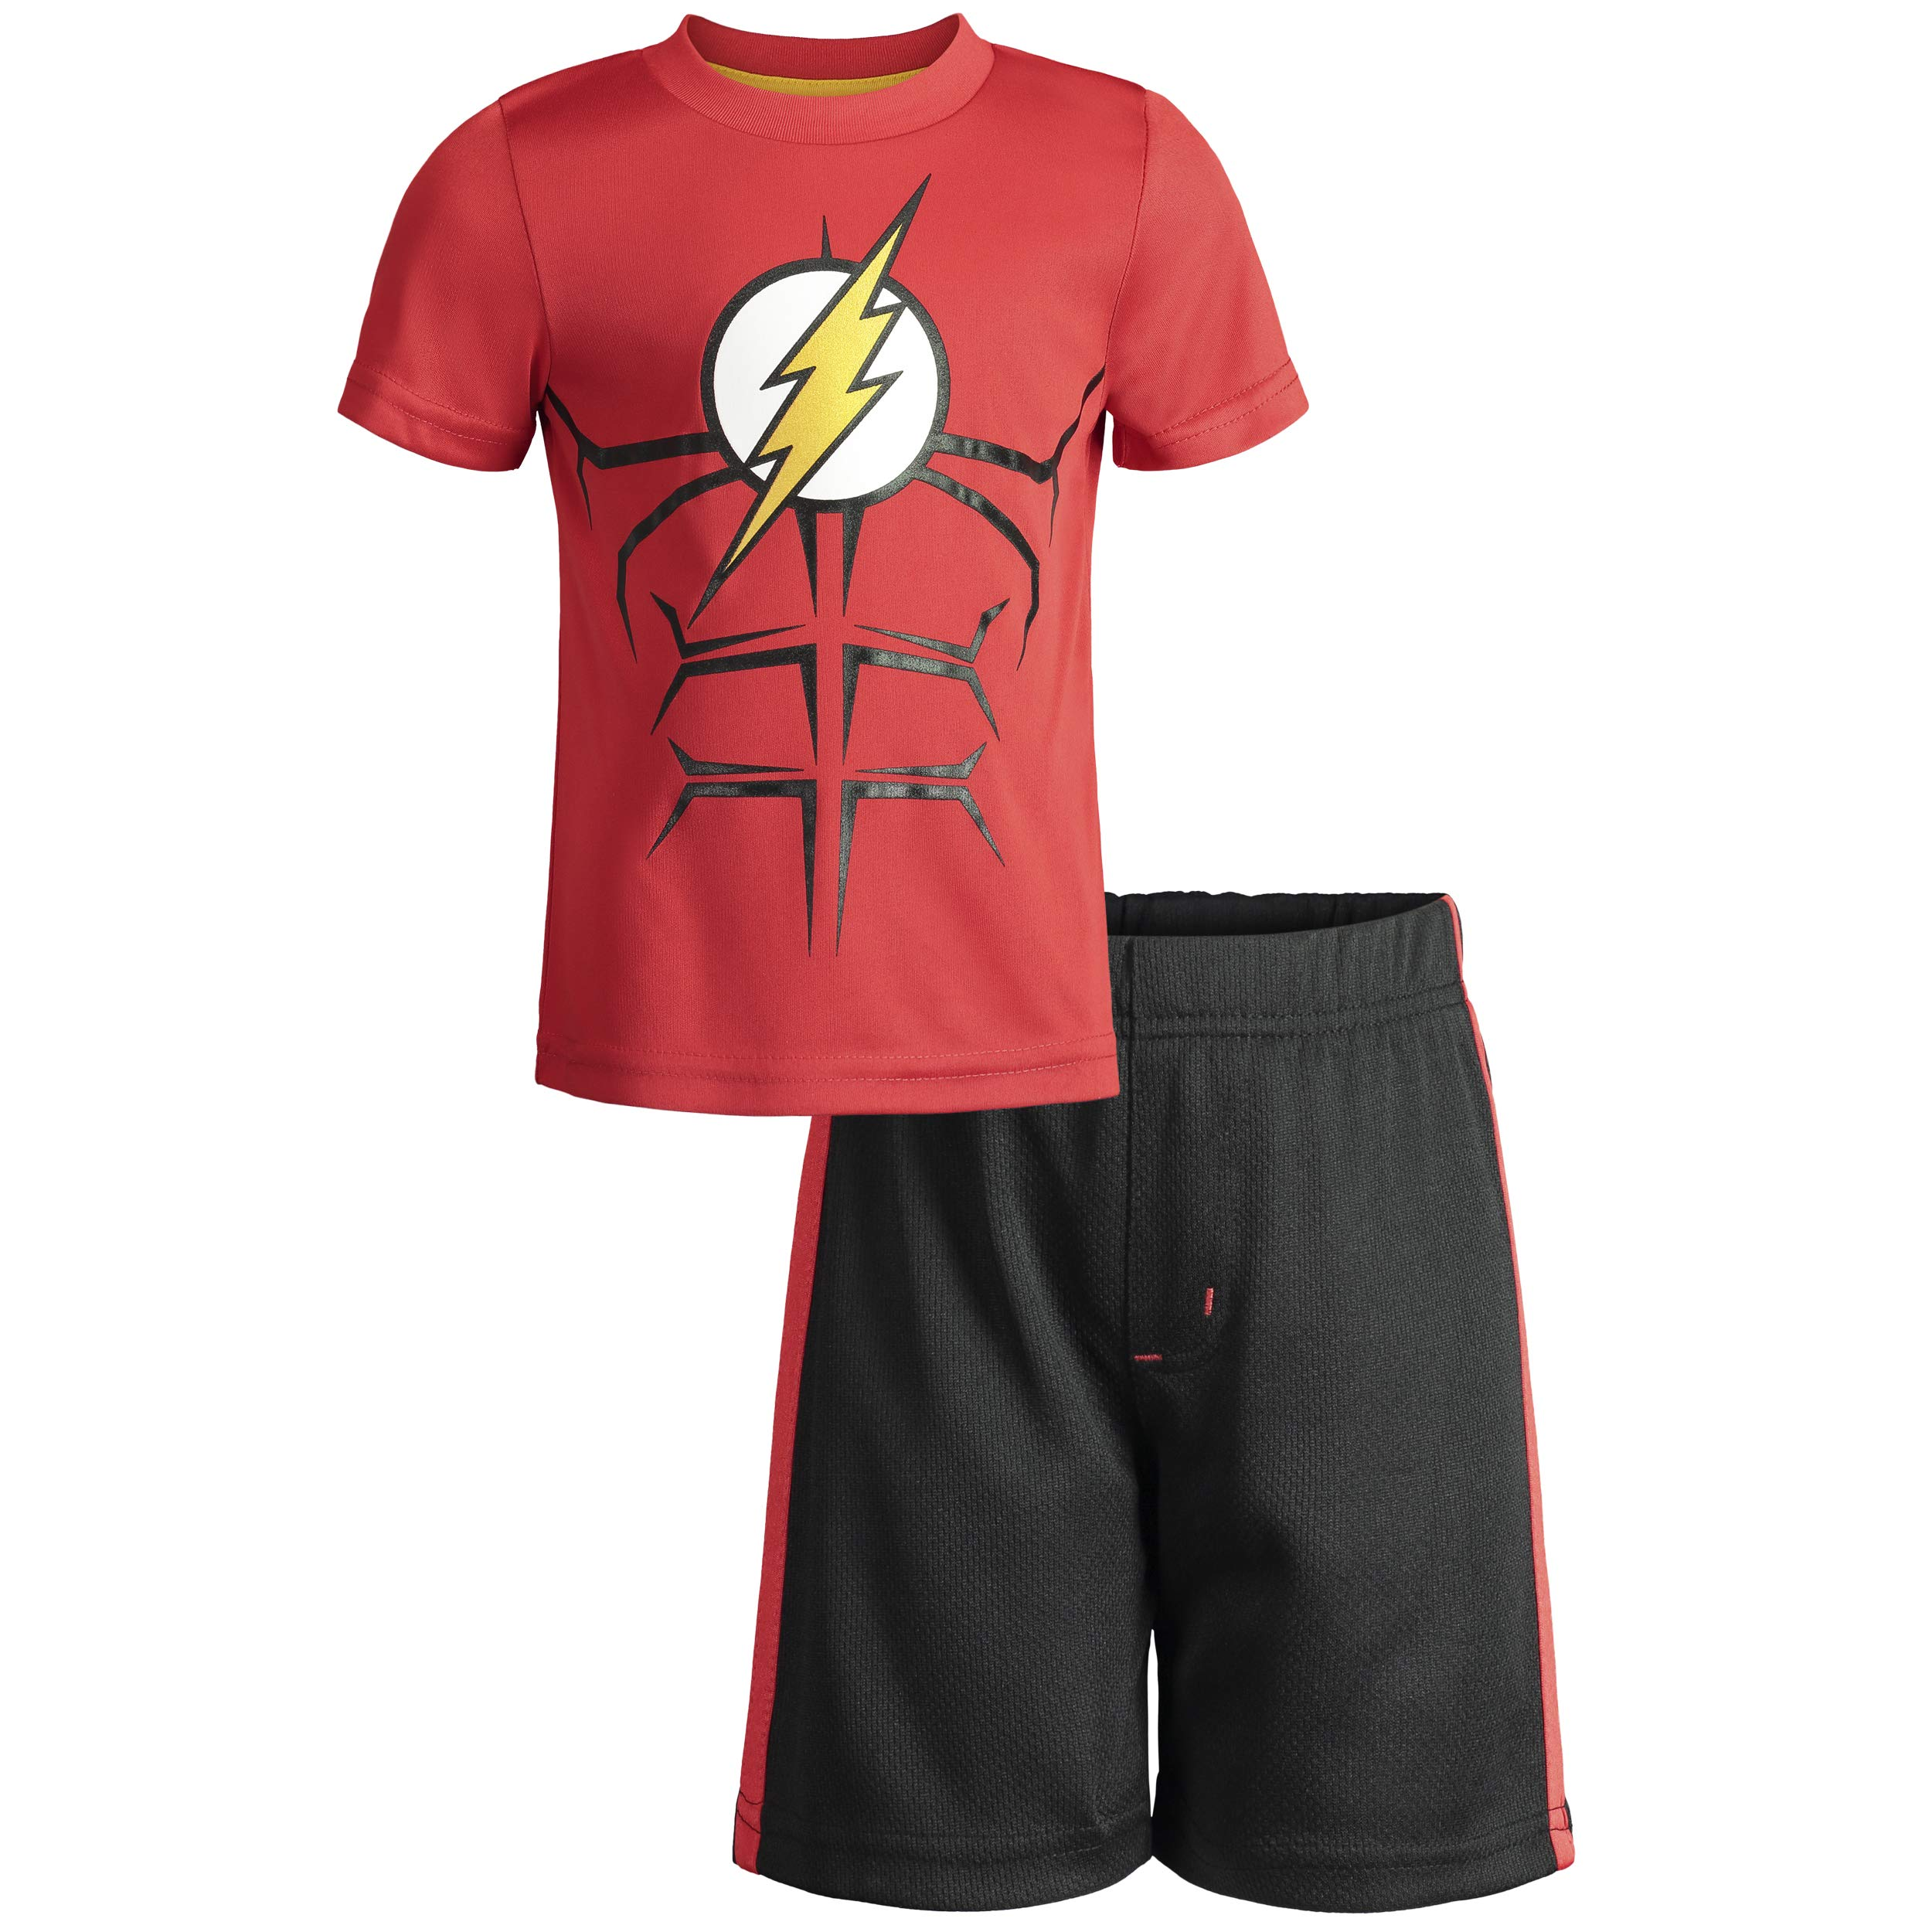 Warner Bros The Flash Little Boys' Athletic Performance T-Shirt & Mesh Shorts Set, Red/Black (5)